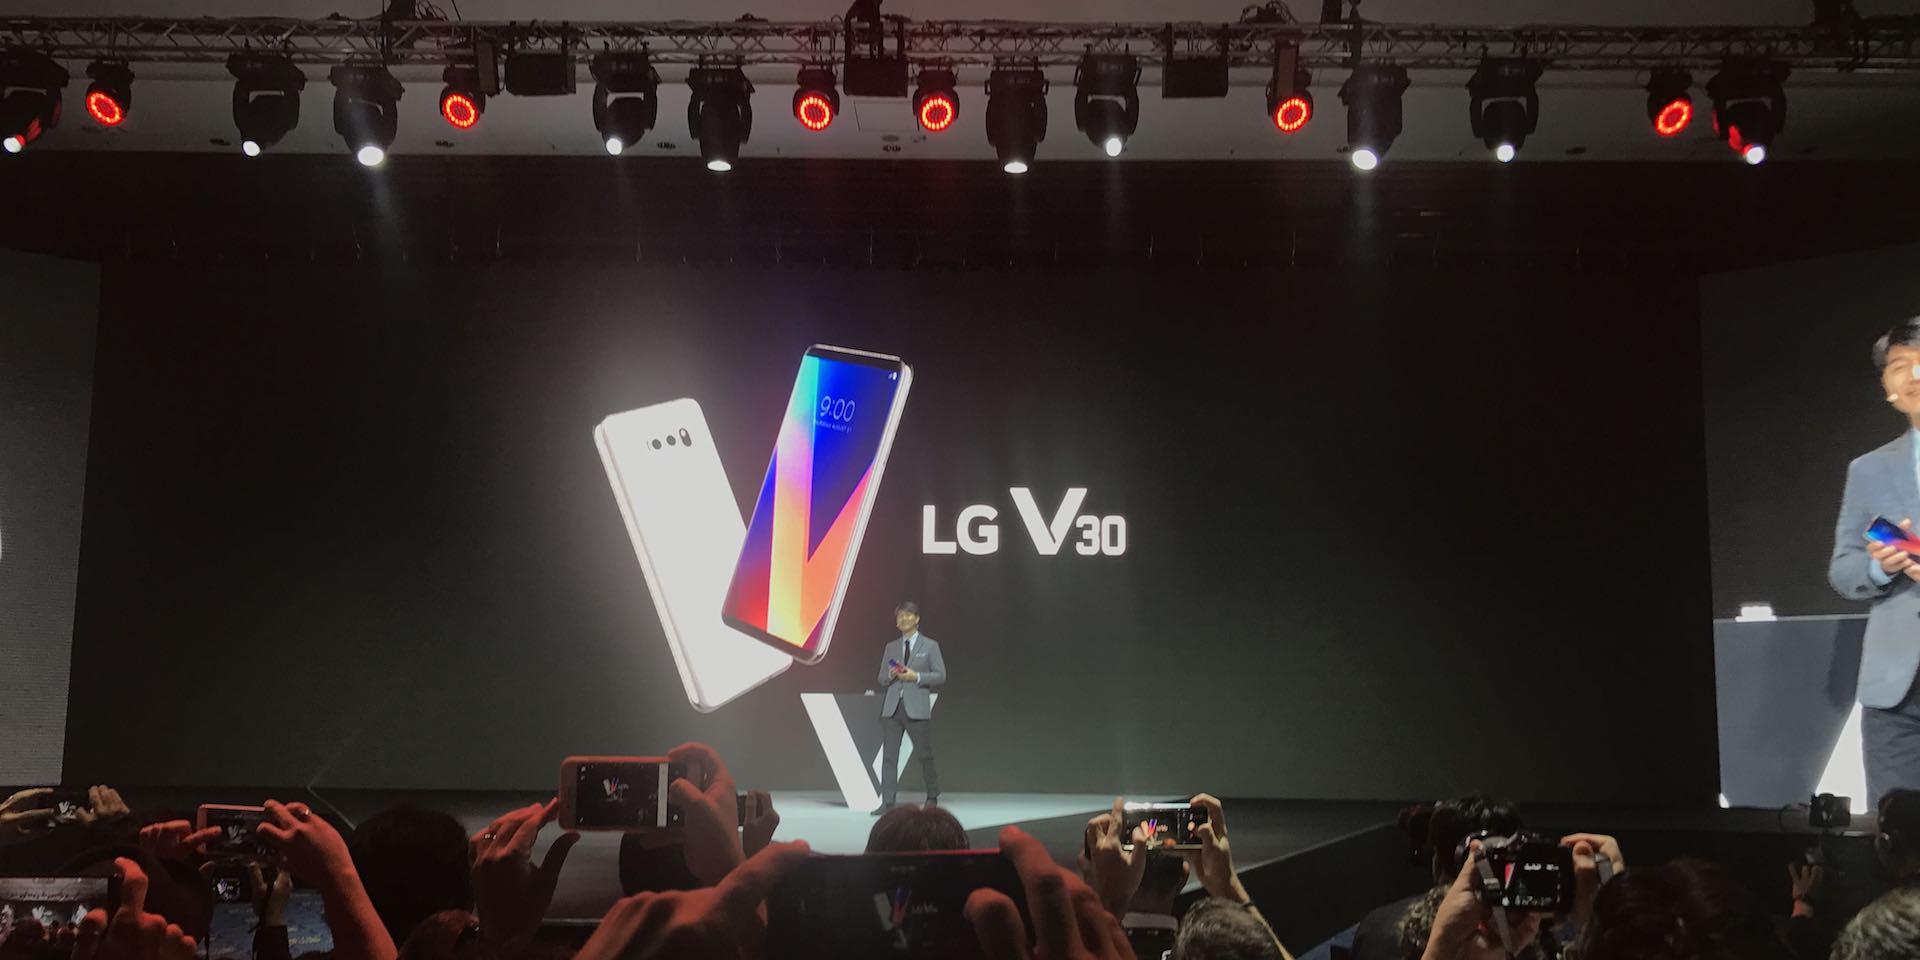 LG V30 announcement